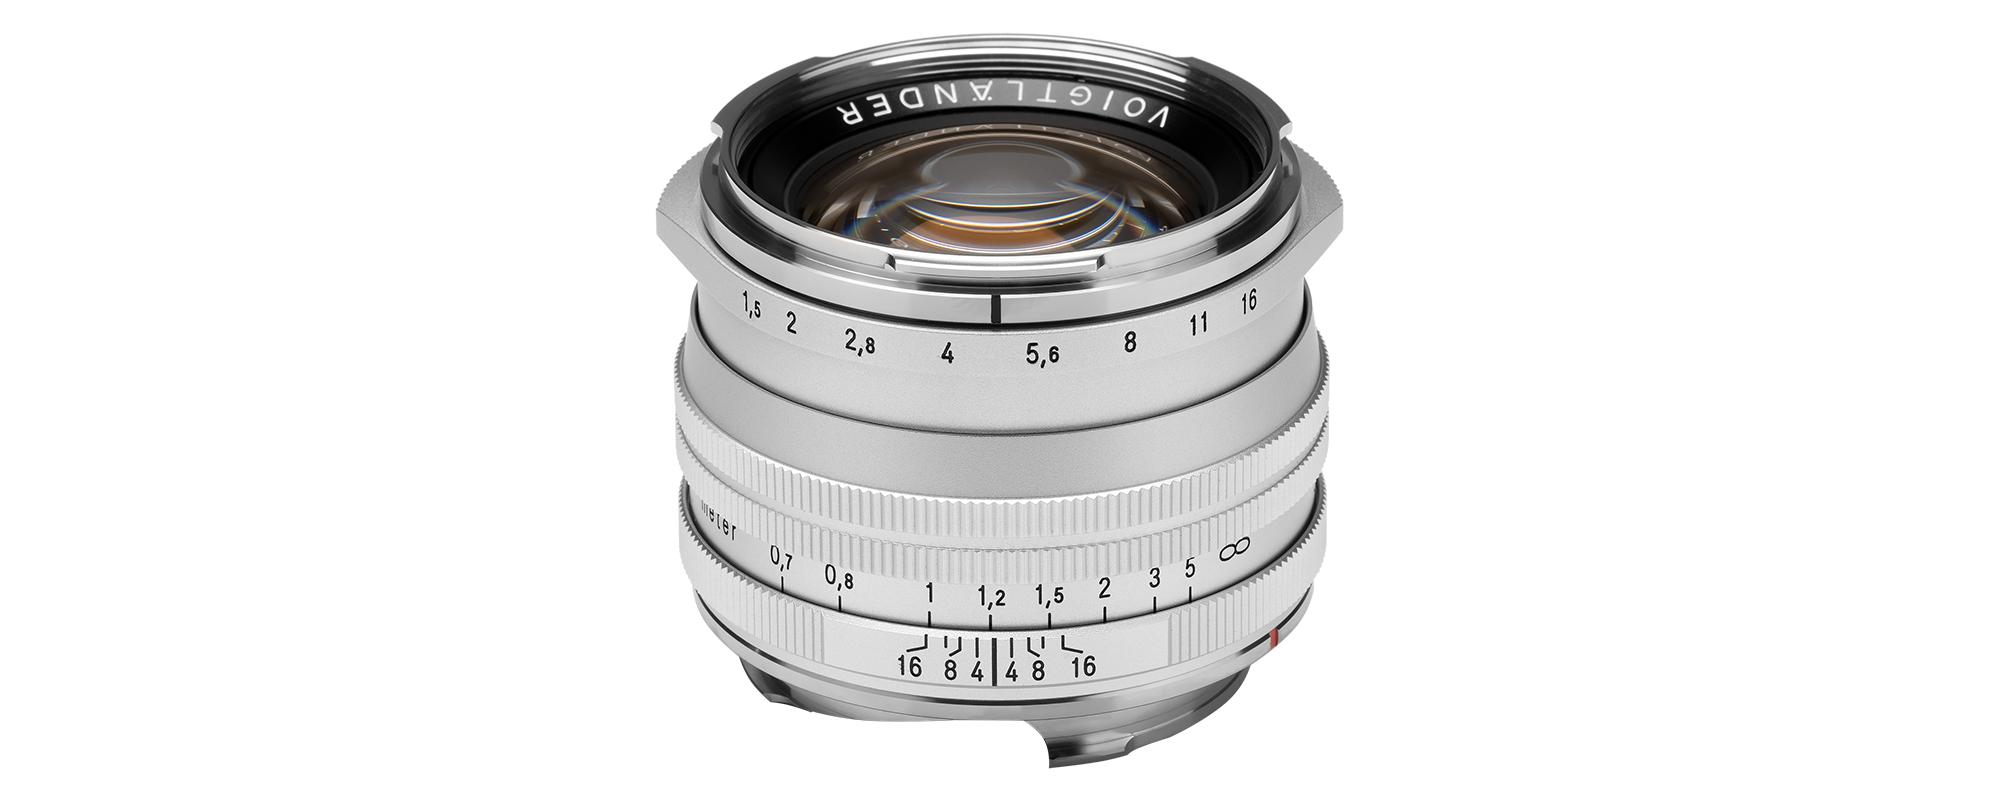 Voigtlander Nokton II 50 mm f/1.5 lens for Leica M - SC, silver